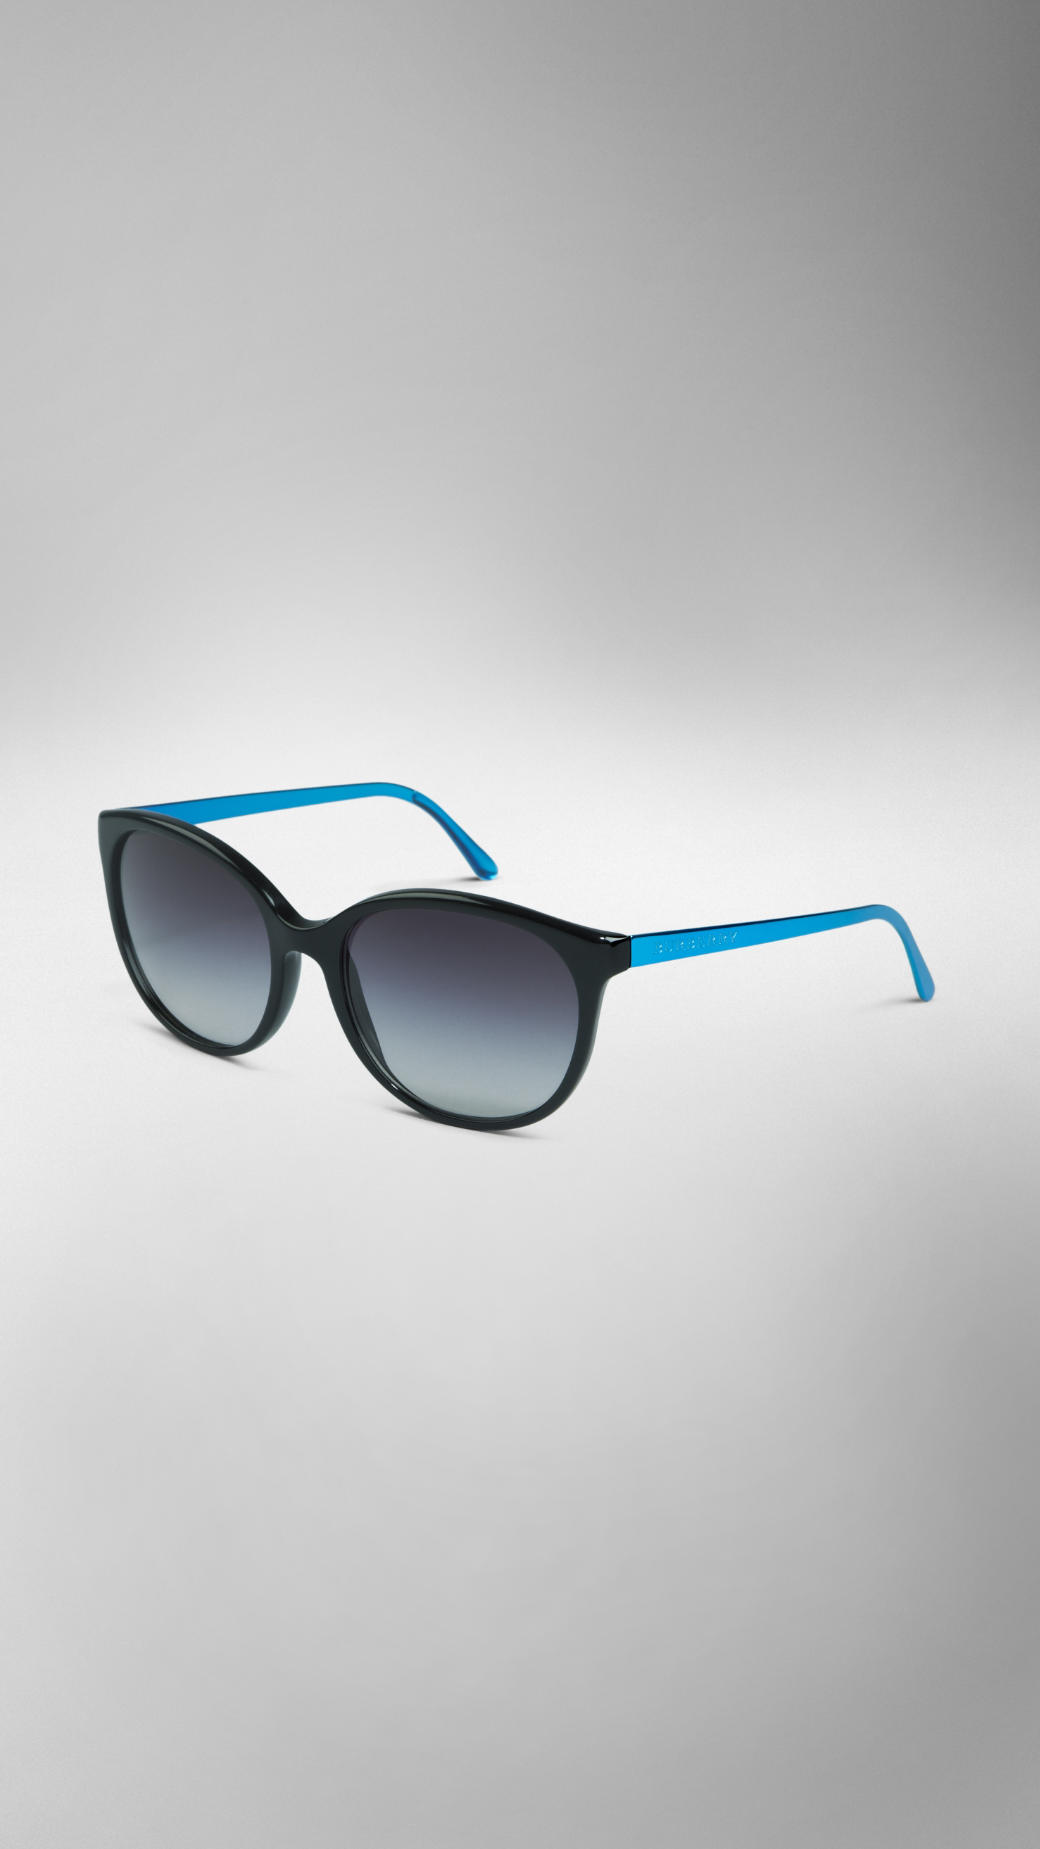 9d63627cefd Lyst - Burberry Spark Cat-Eye Sunglasses in Black